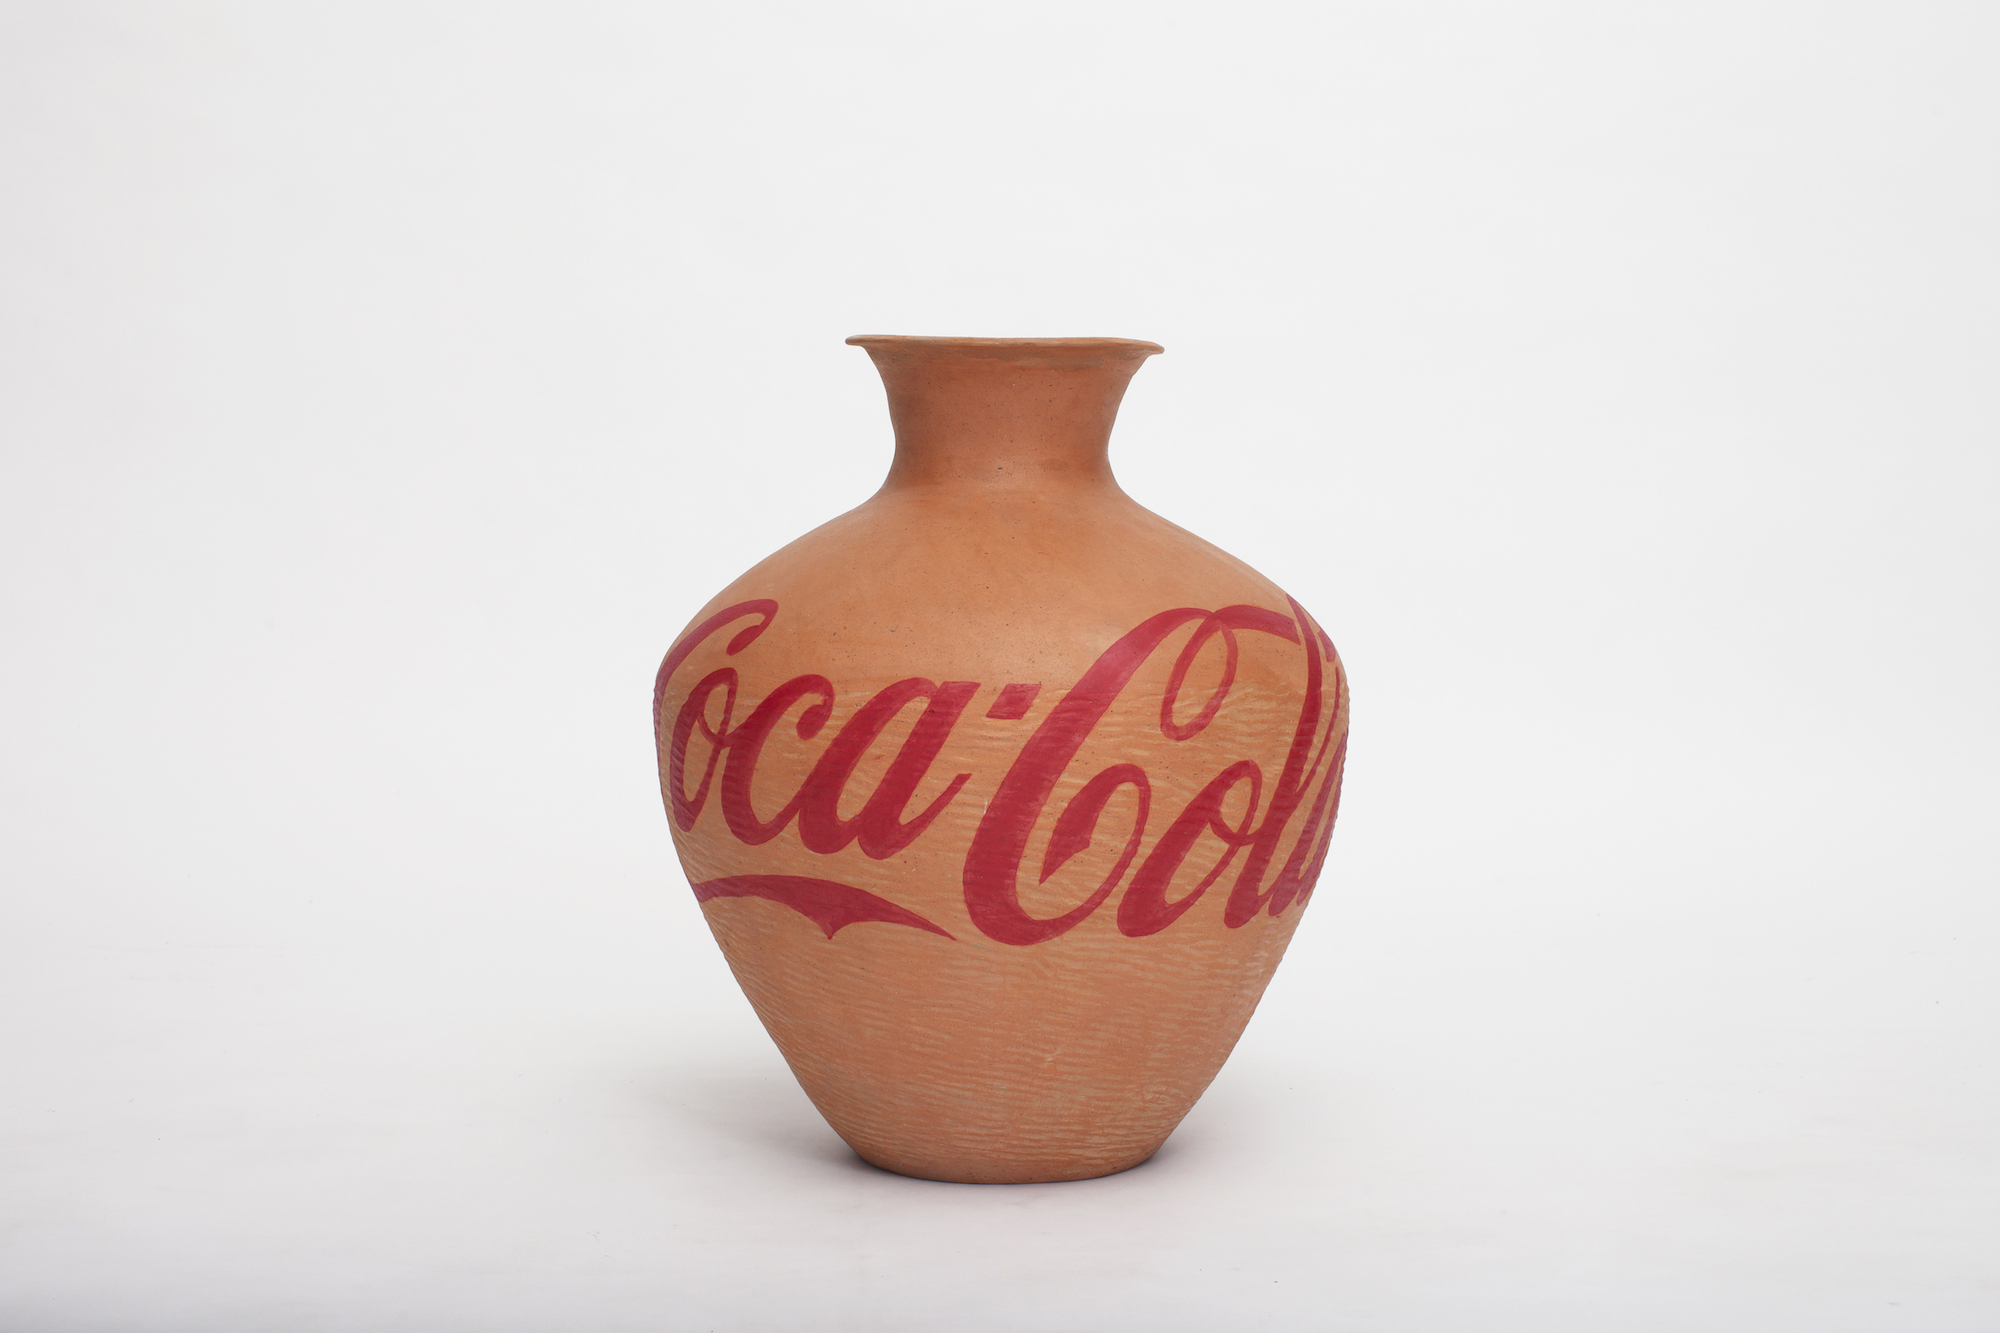 Ai Weiwei, Coca Cola Vase, 2015 © Ai Weiwei Studio Courtesy Lisson Gallery Photographer: Liidongxu